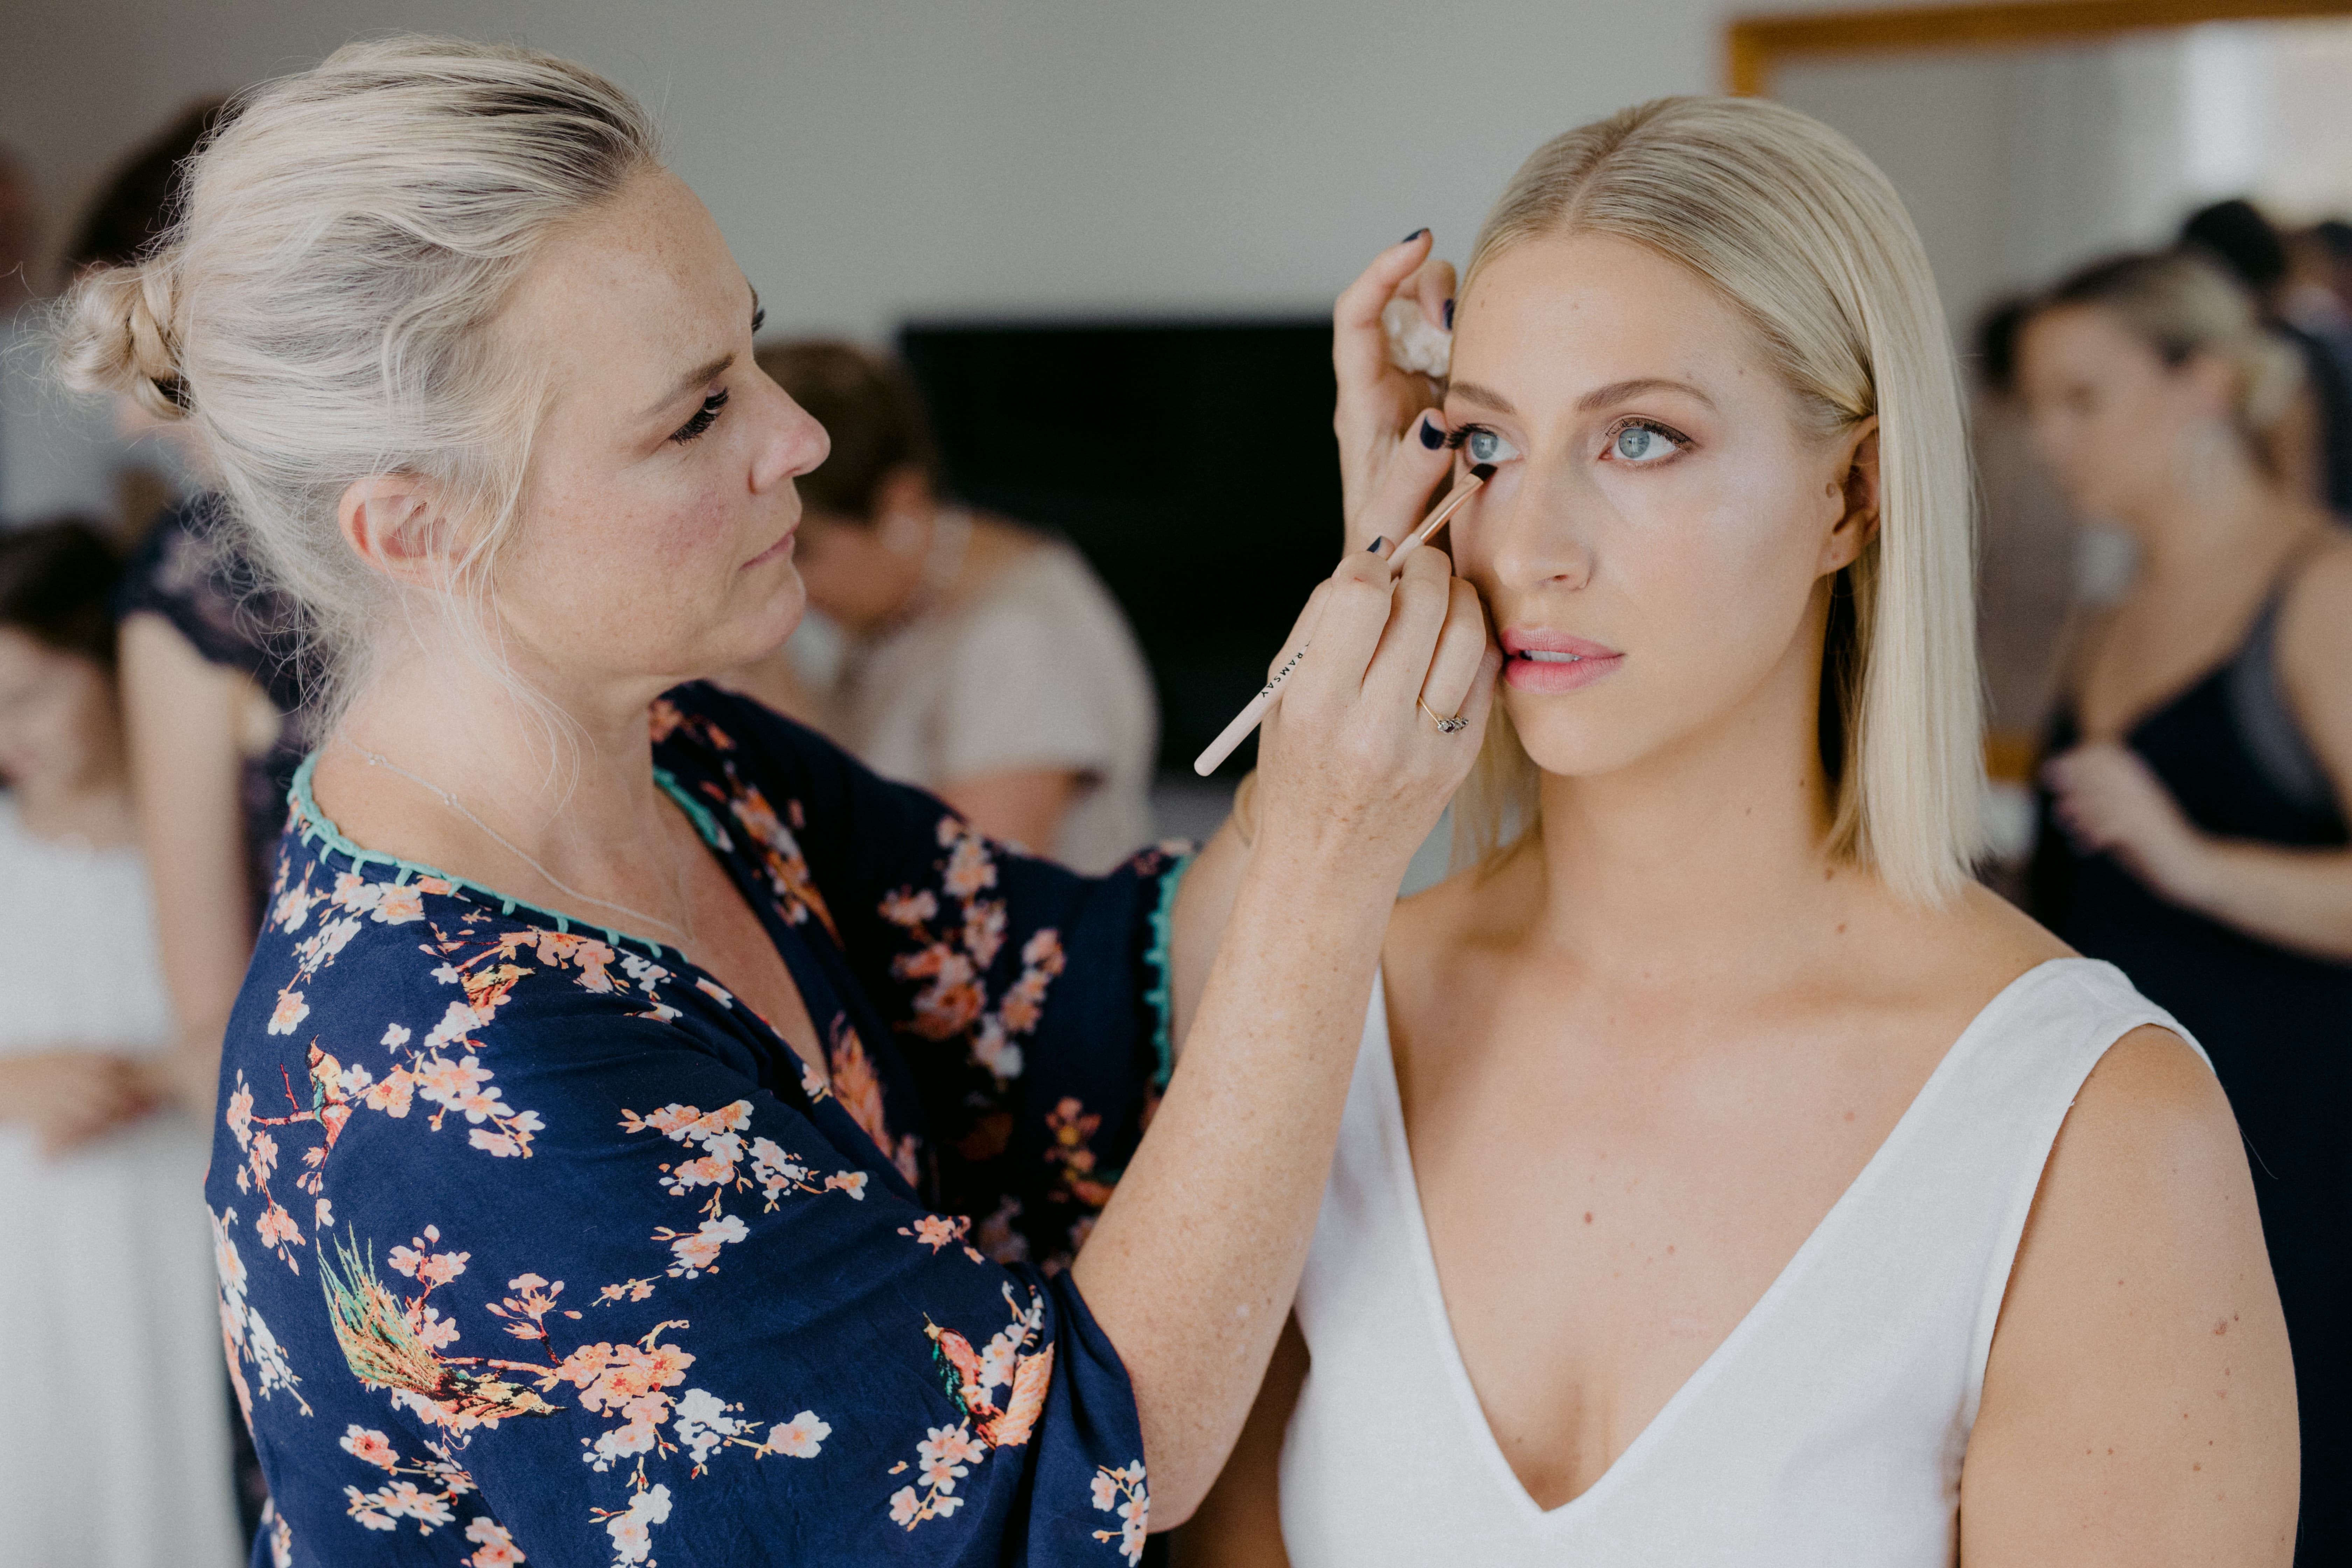 makeup application on bridesmaid